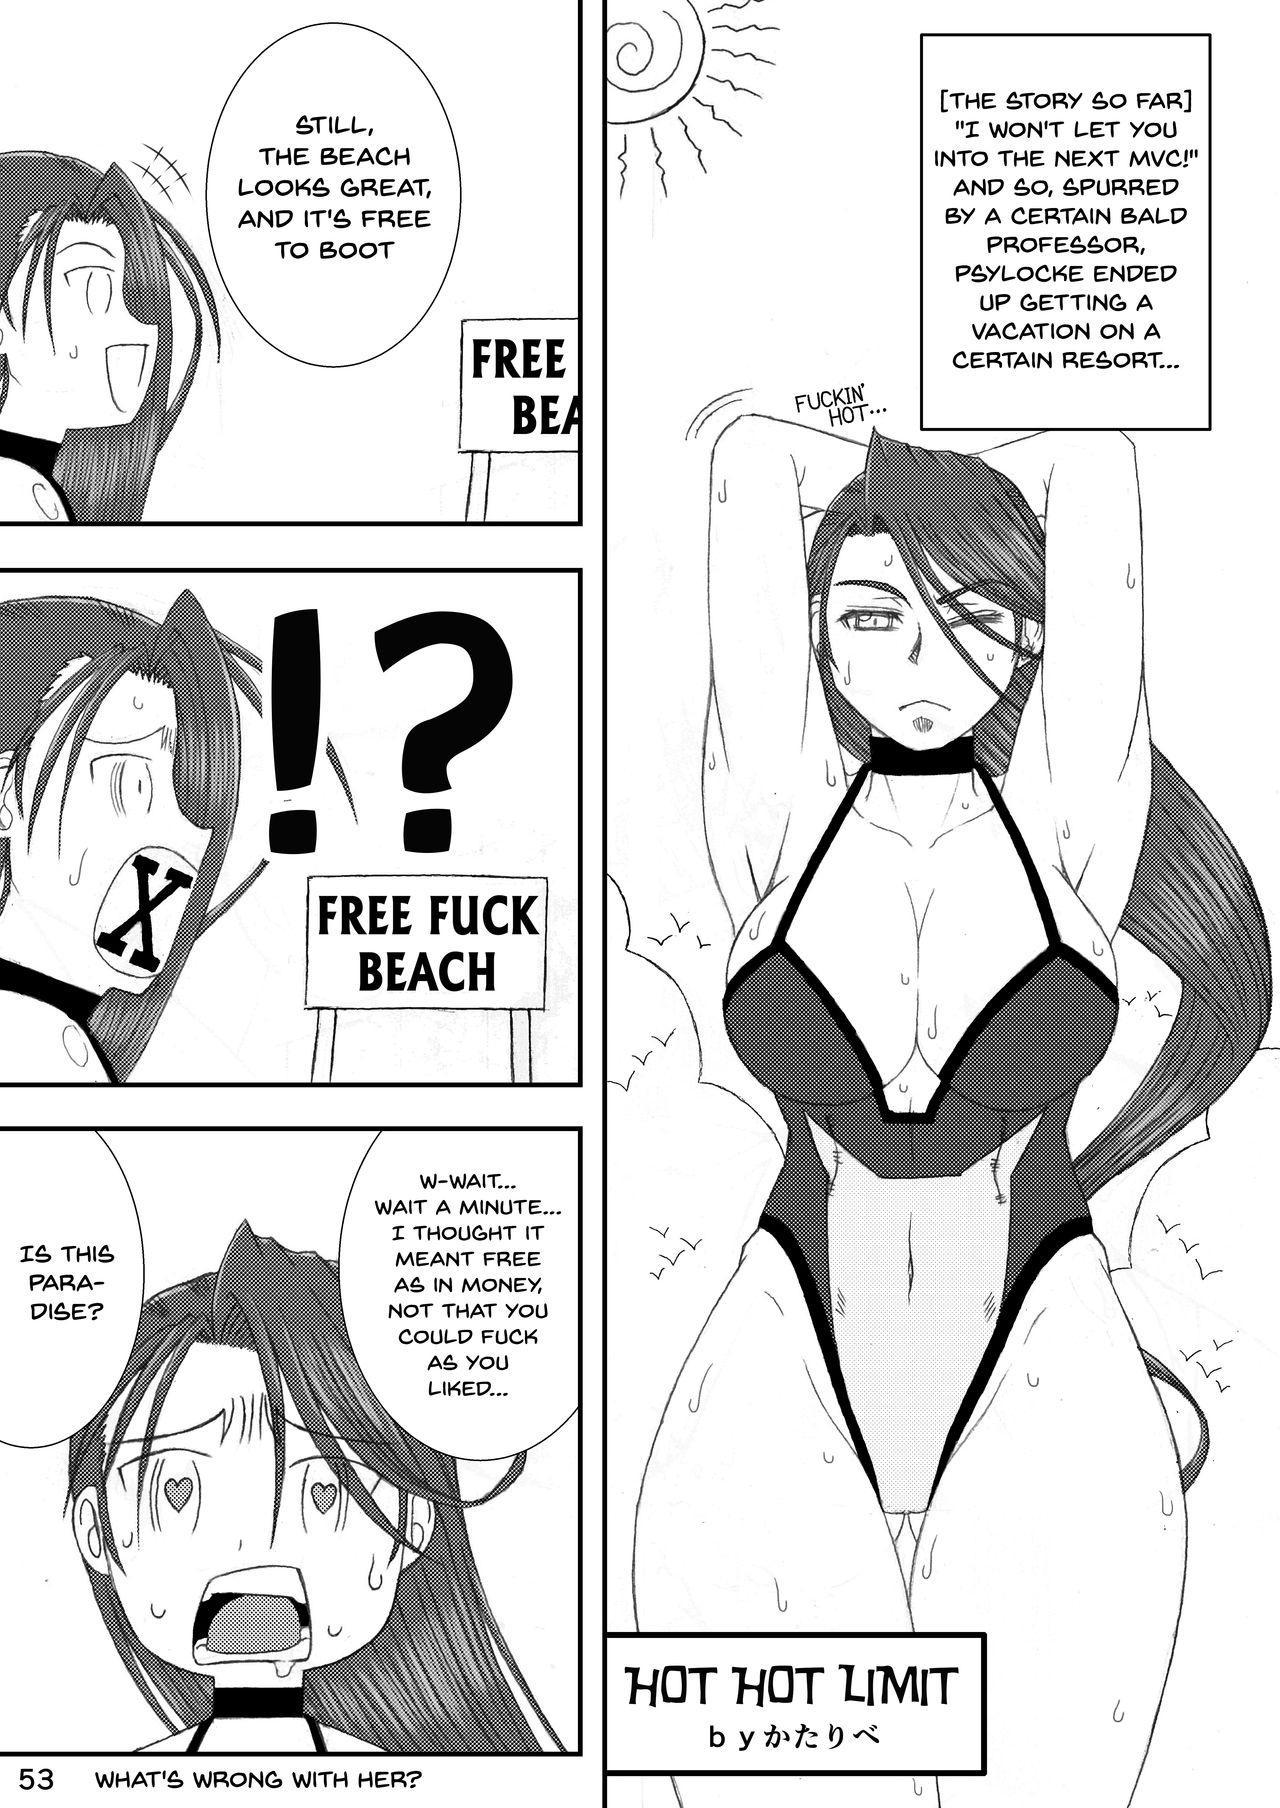 [POWERPLAY (Various)] CAPCOM (& MORE!) VS FIGHTING GIRLS Swimsuit & Gangbang Special (Various) [English] {Doujins.com} [Digital] 49